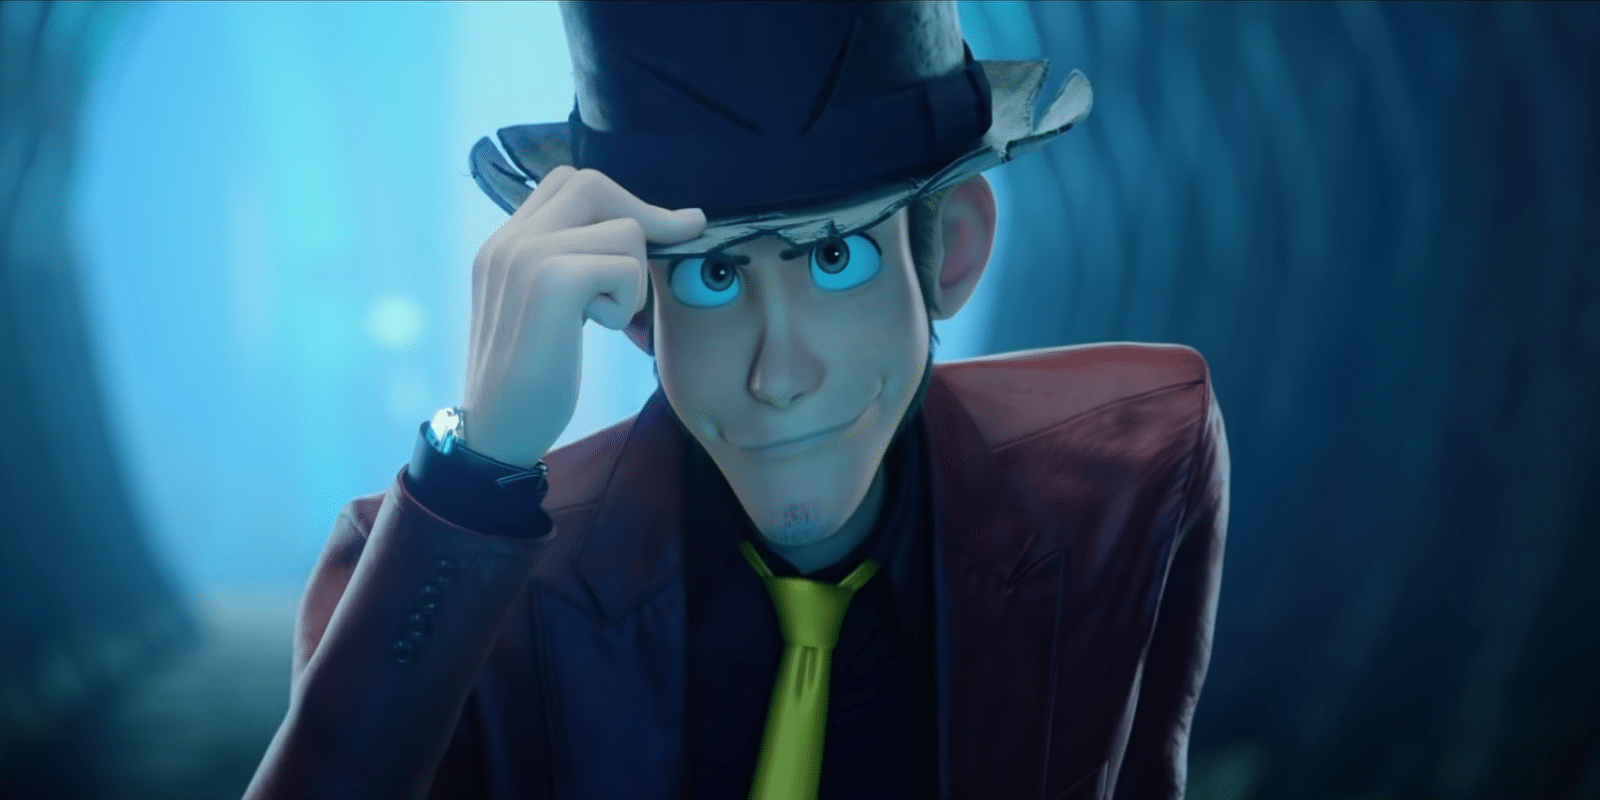 [Keywords] Lupin III and Influence